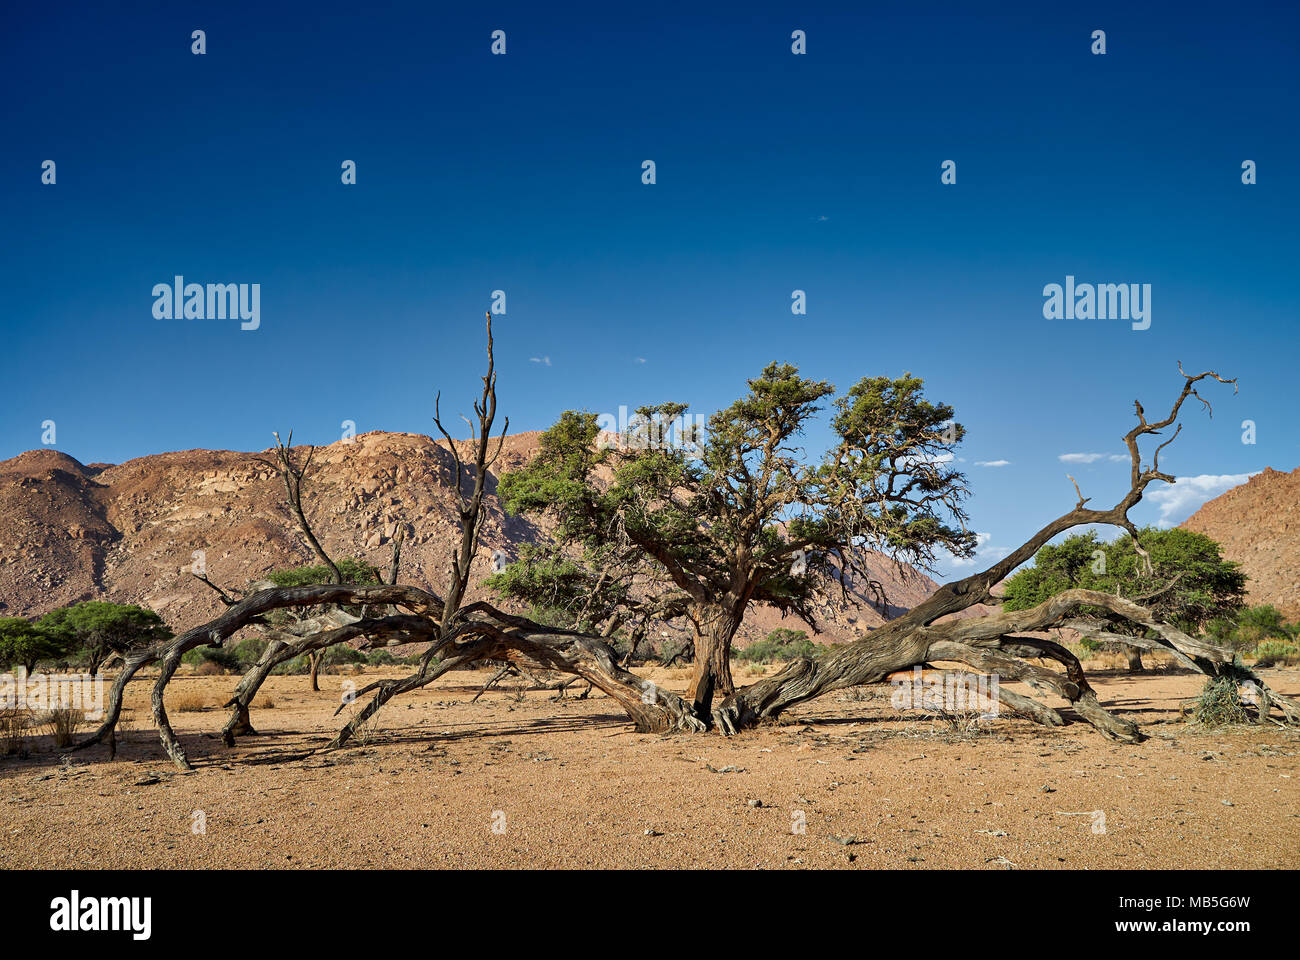 tree in tranquil landscape on Farm Namtib, Tiras mountains, Namibia, Africa Stock Photo